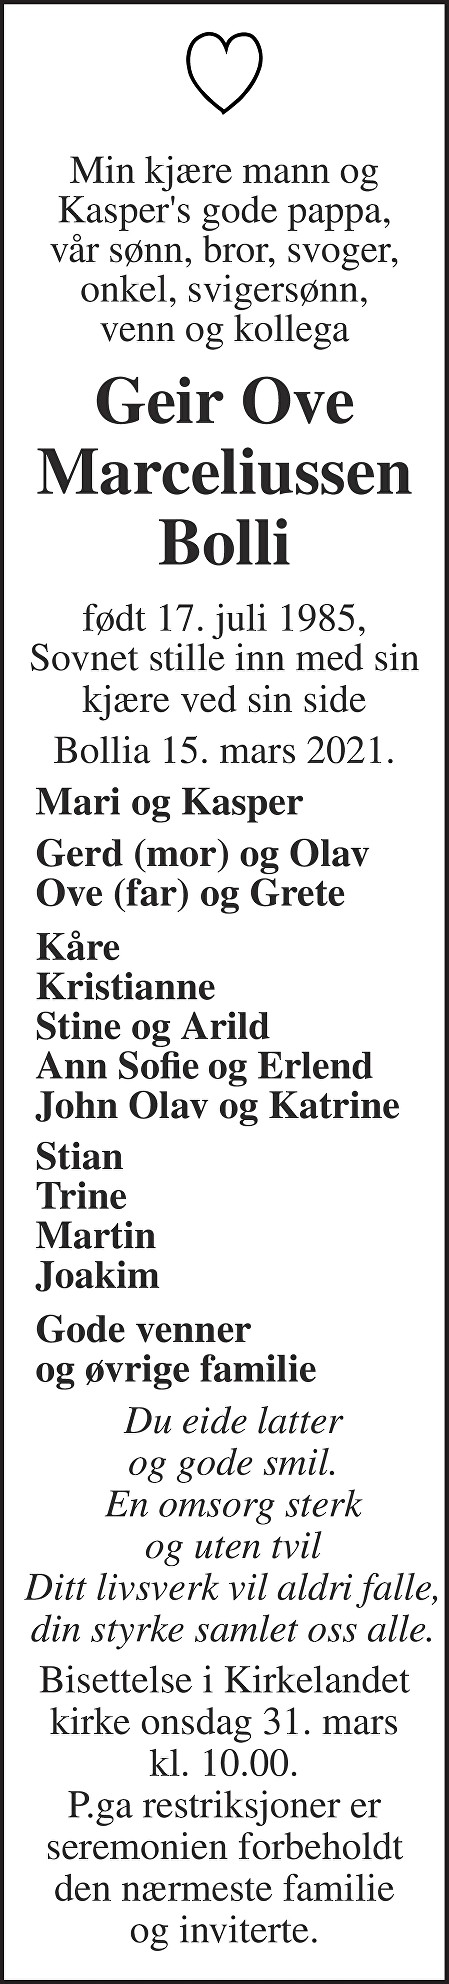 Geir Ove Marceliussen Bolli Dødsannonse